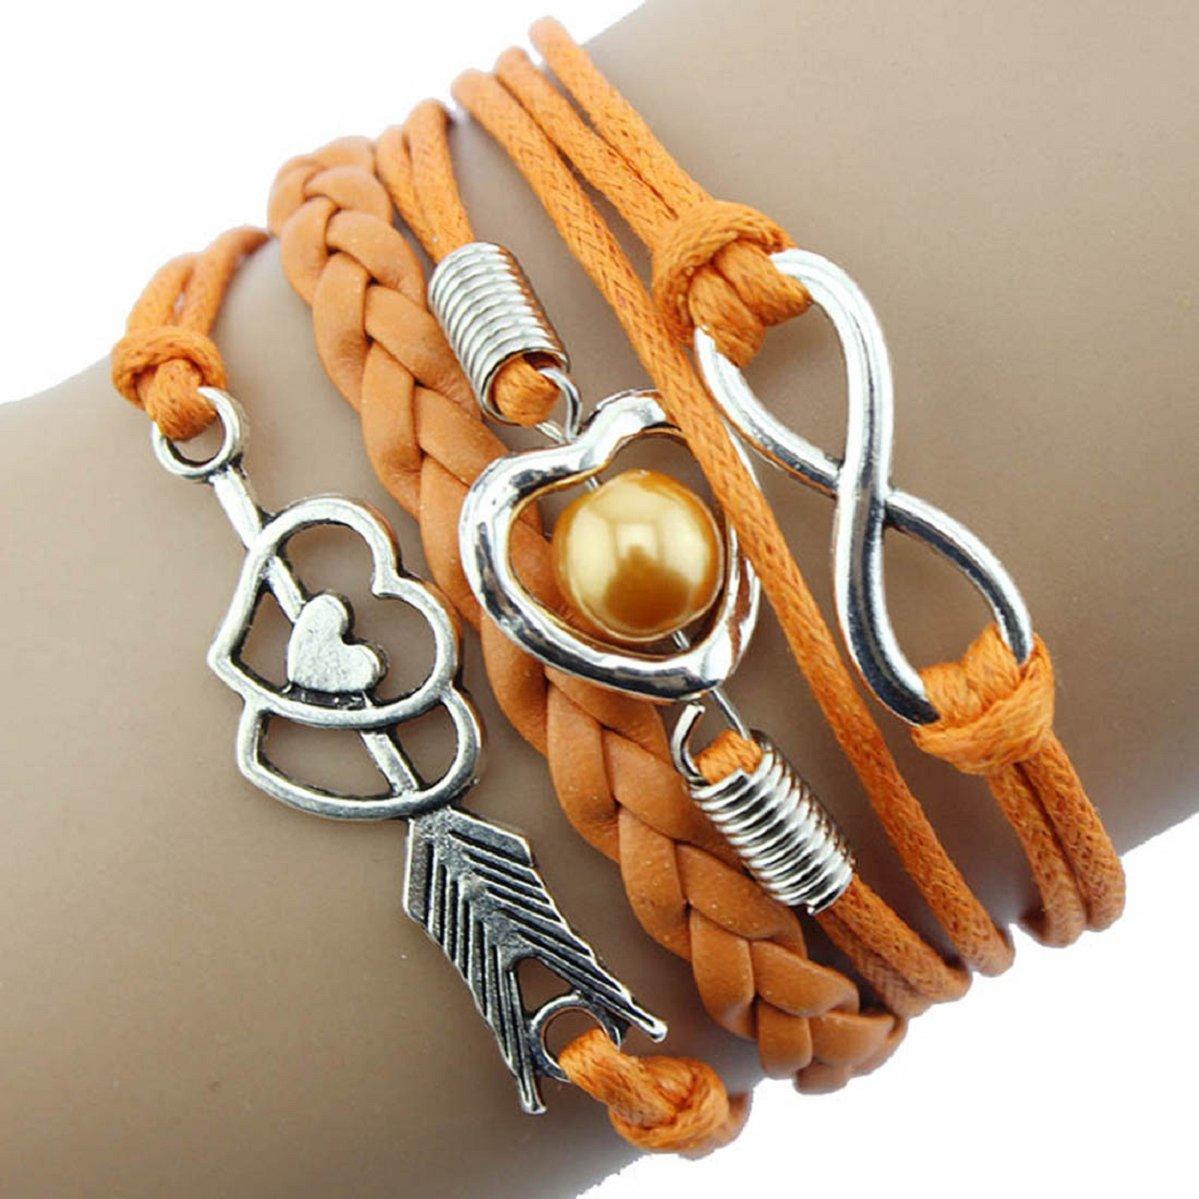 DOINSHOP Infinity Love Heart Pearl Friendship Antique Leather Charm Bracelet (pink)